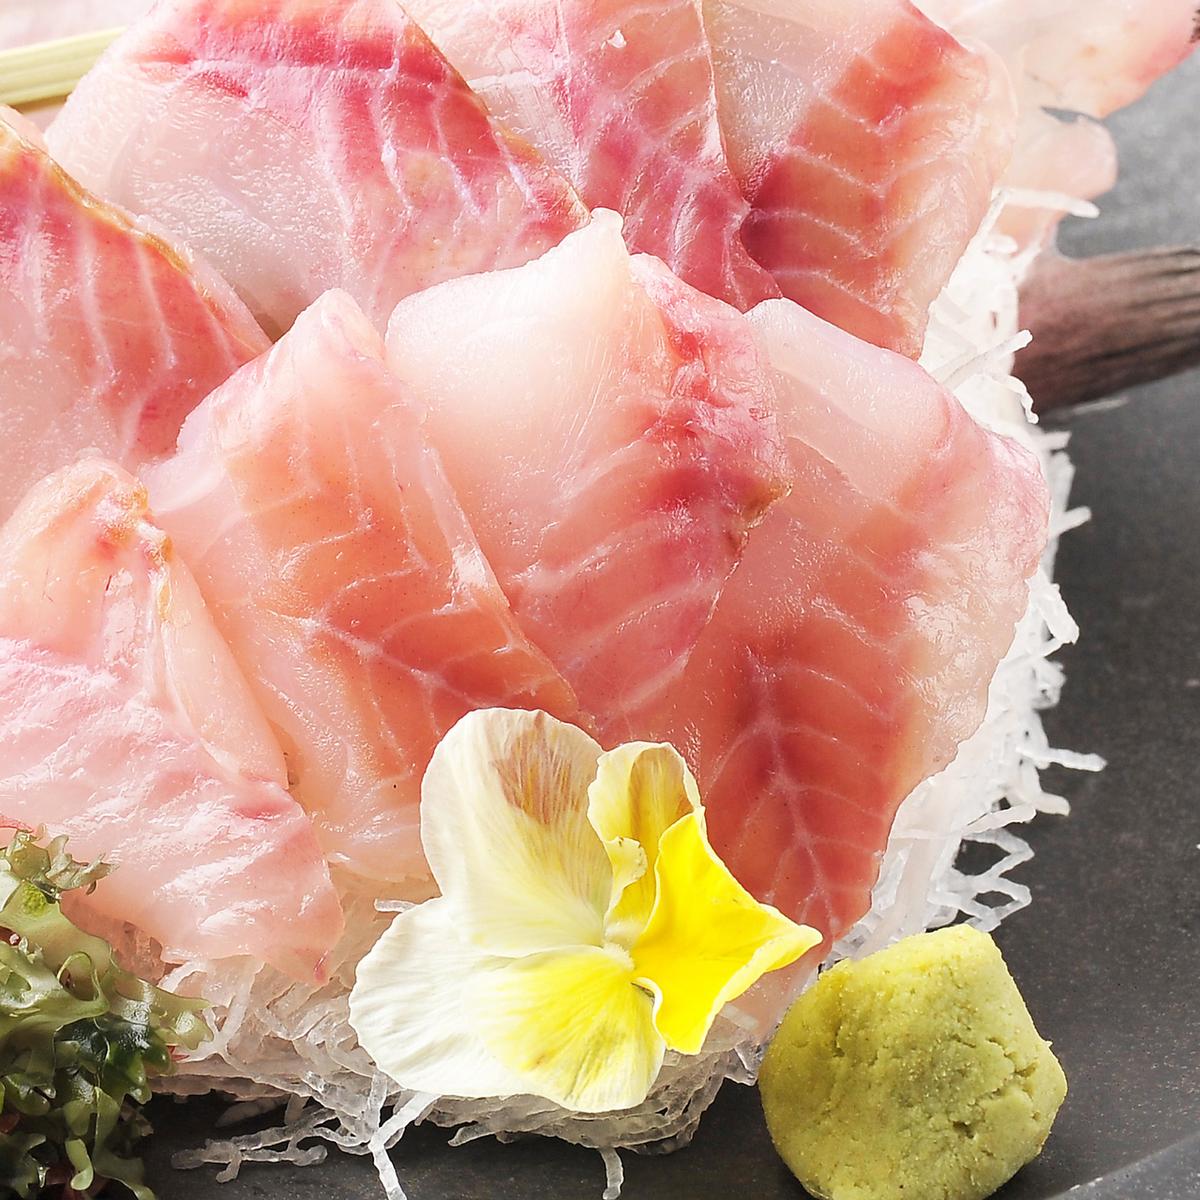 Soy sashimi